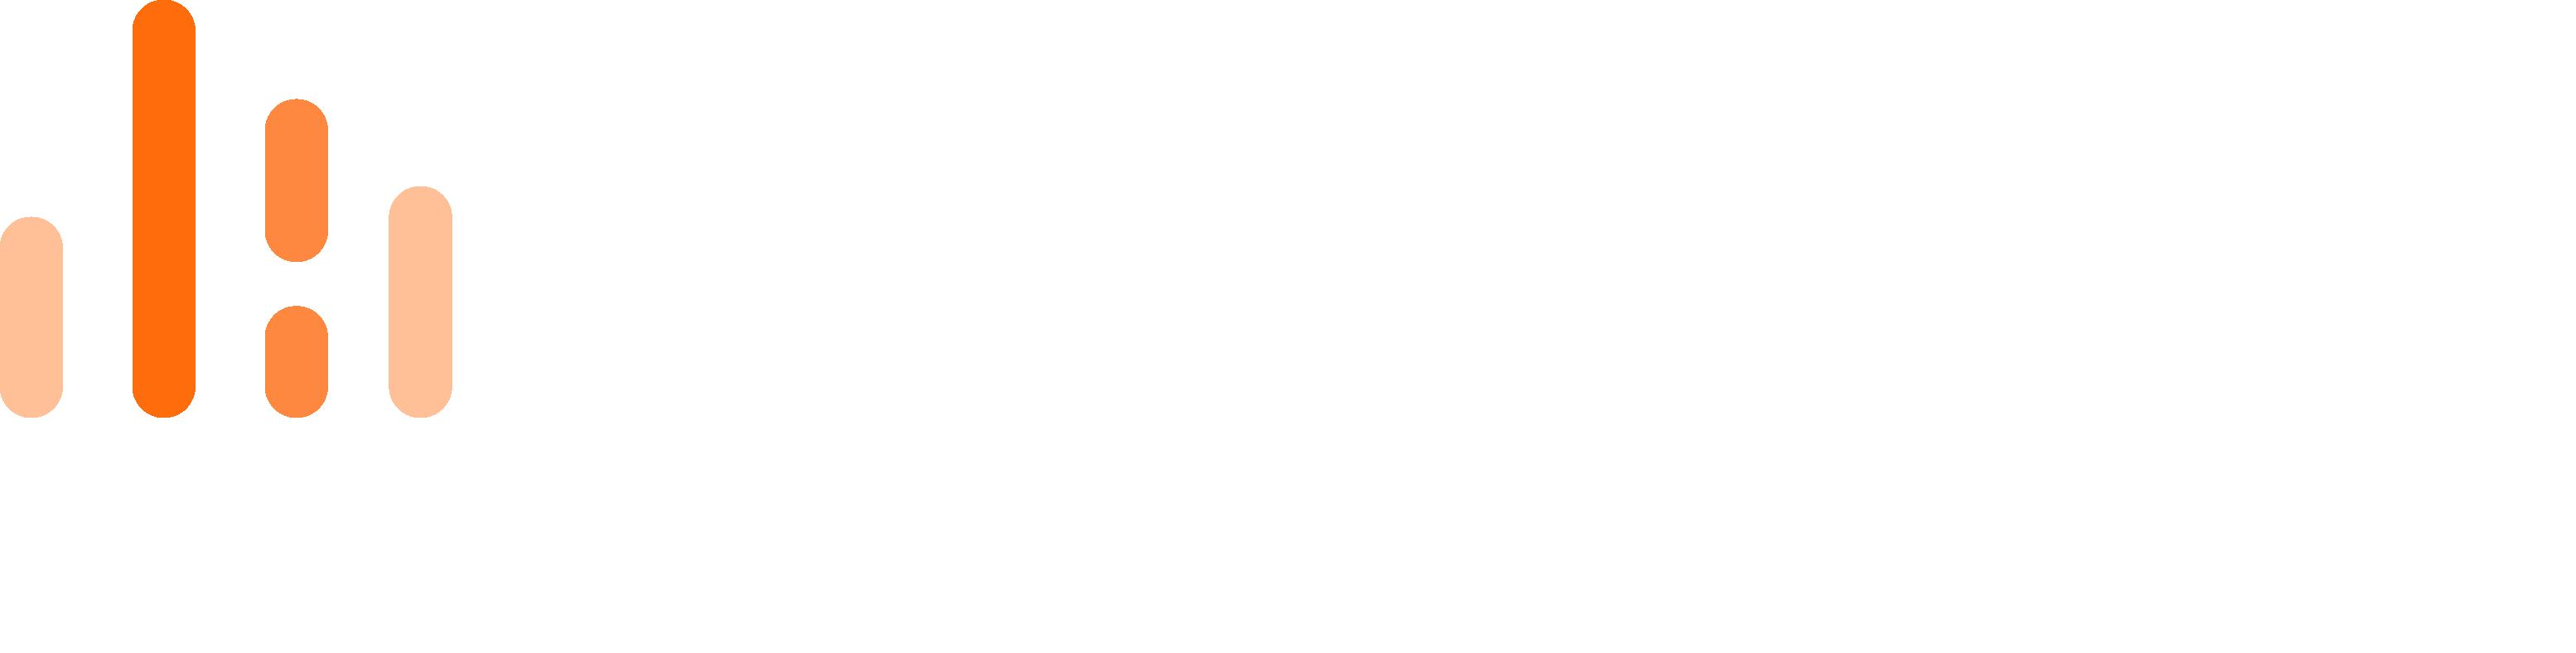 probax logo.jpg